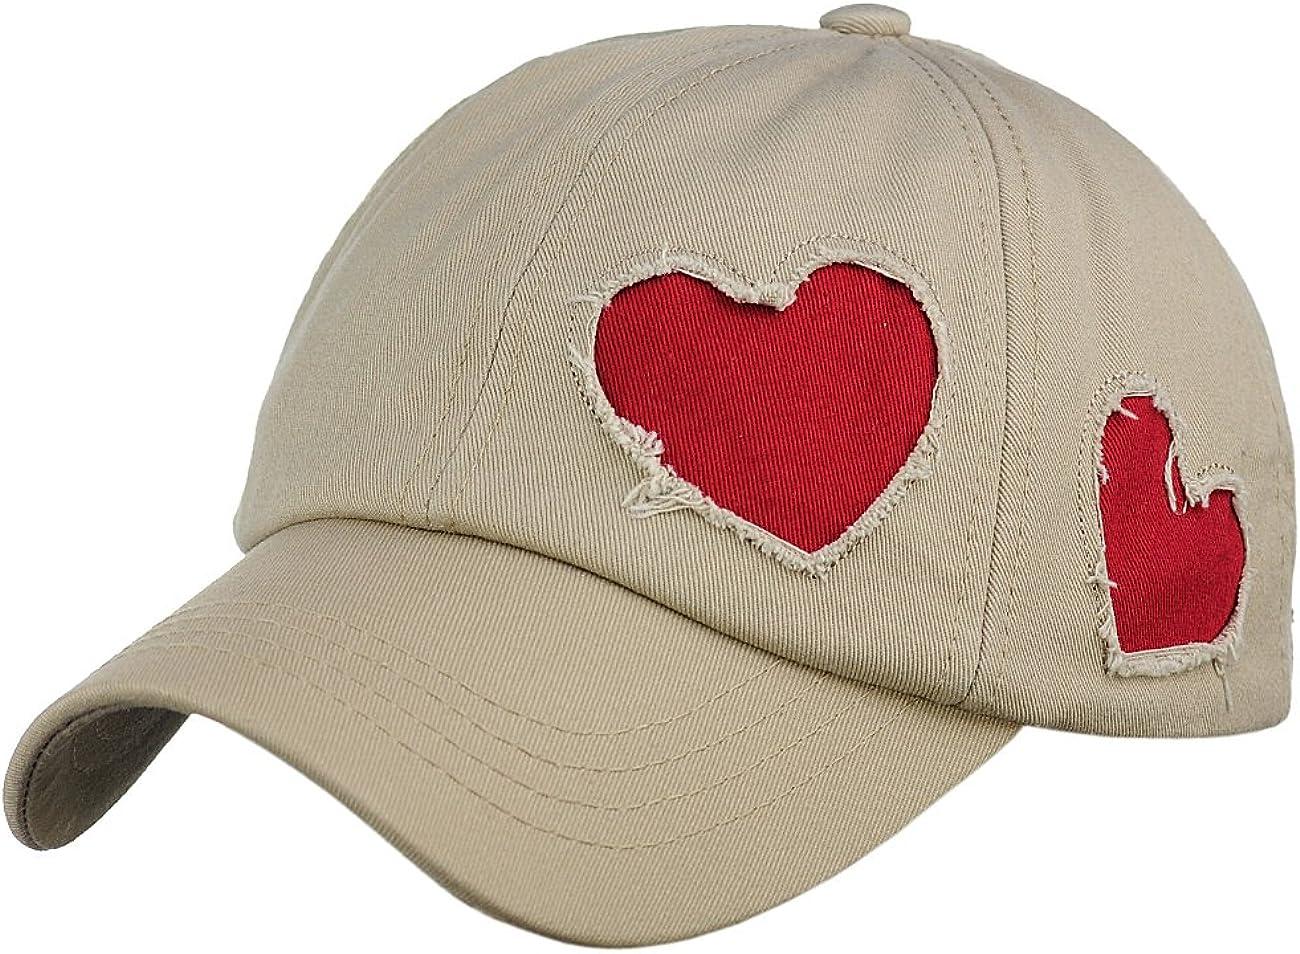 C.C Women's Heart Cut Design Cotton Unstructured Precurved Baseball Cap Hat